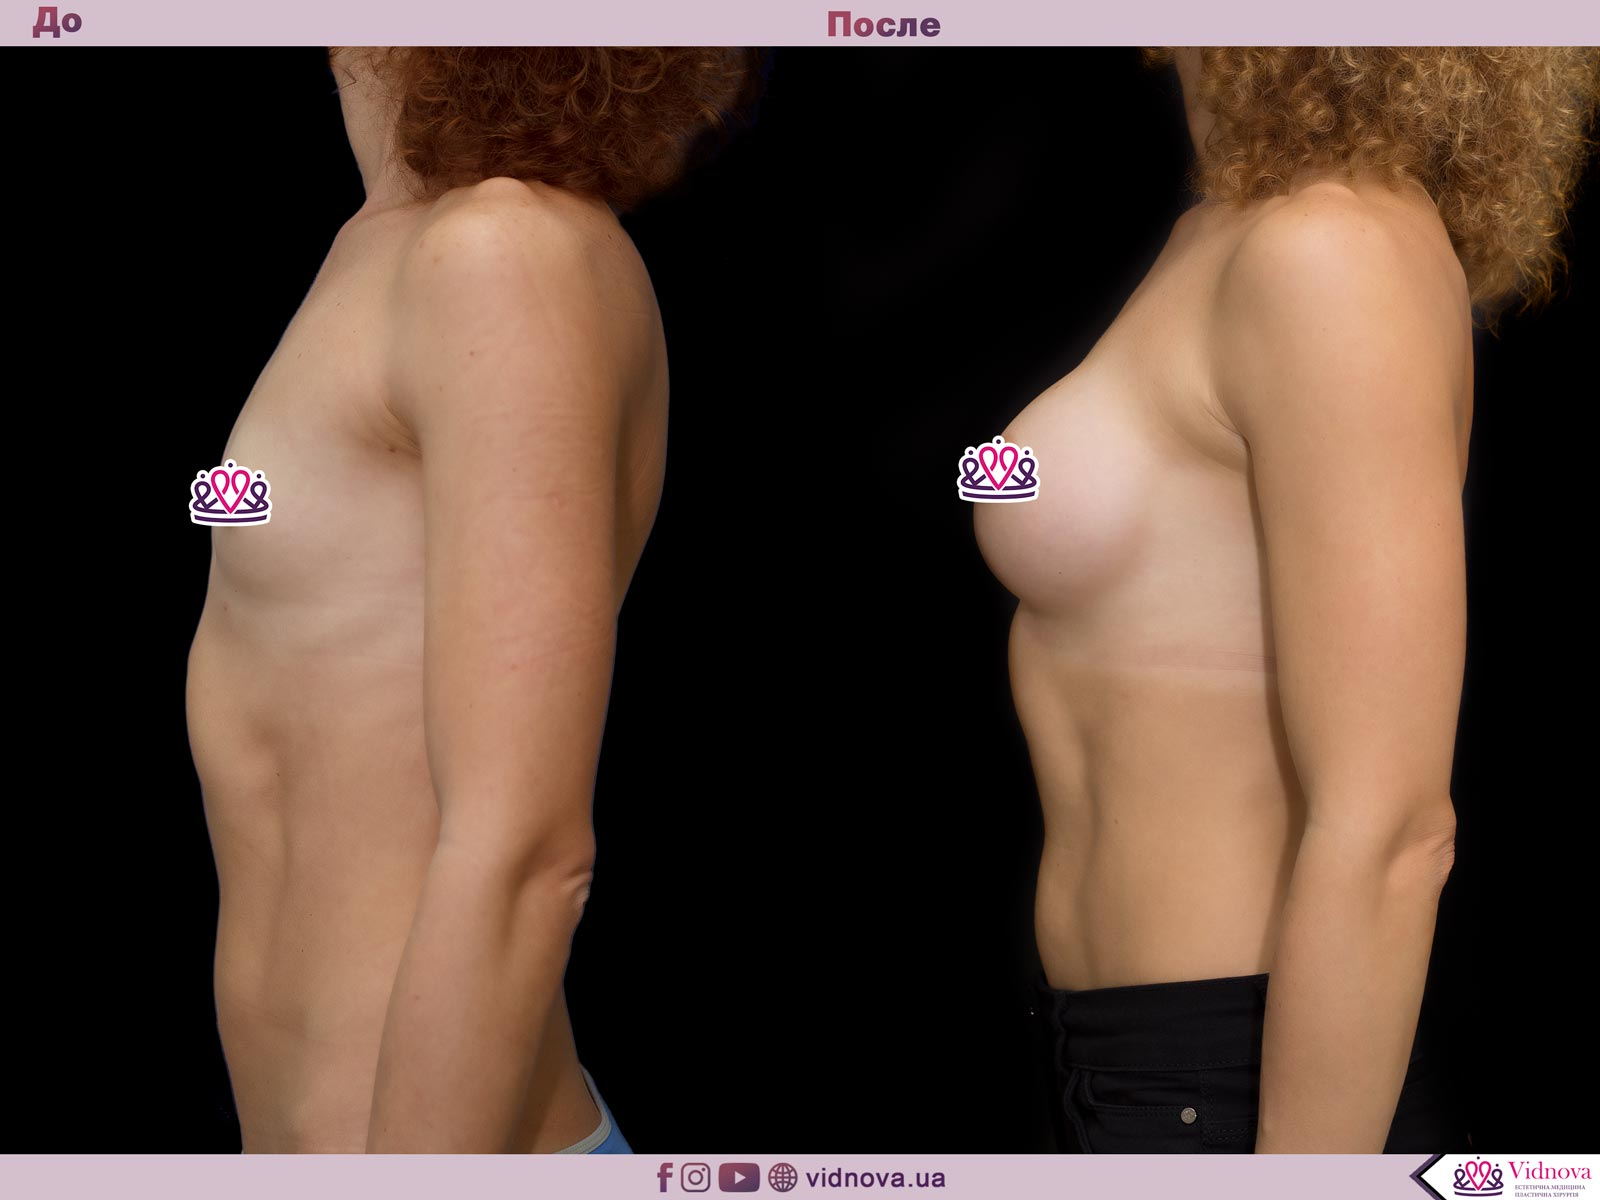 Увеличение груди: Фото ДО и ПОСЛЕ - Пример №42-3 - Клиника Vidnova